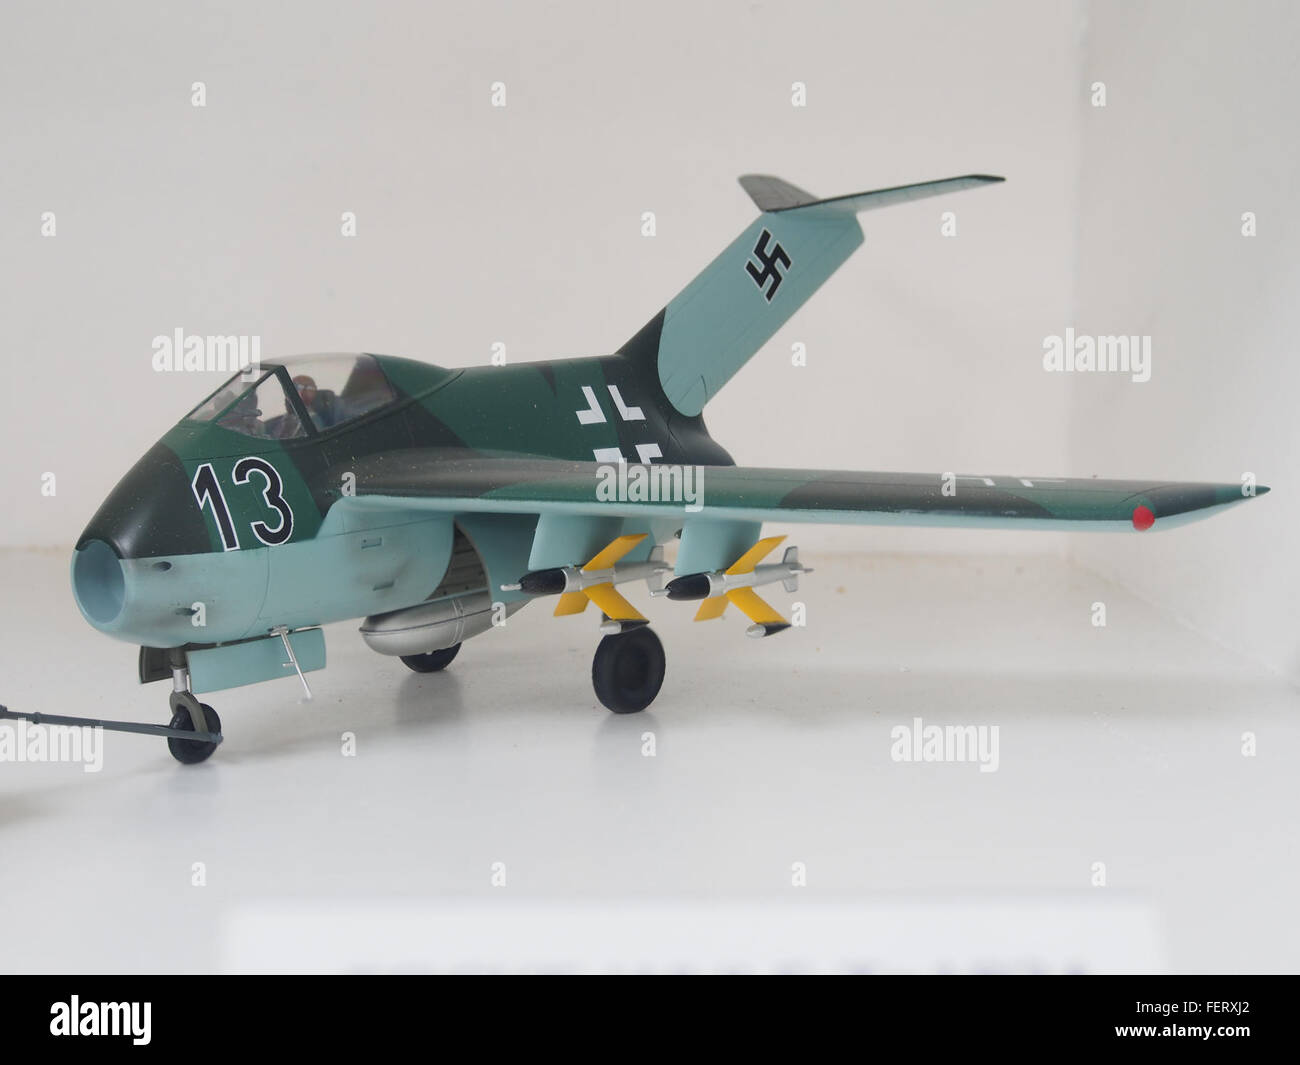 Focke Wulf Ta183A Huckebein pic2 - Stock Image